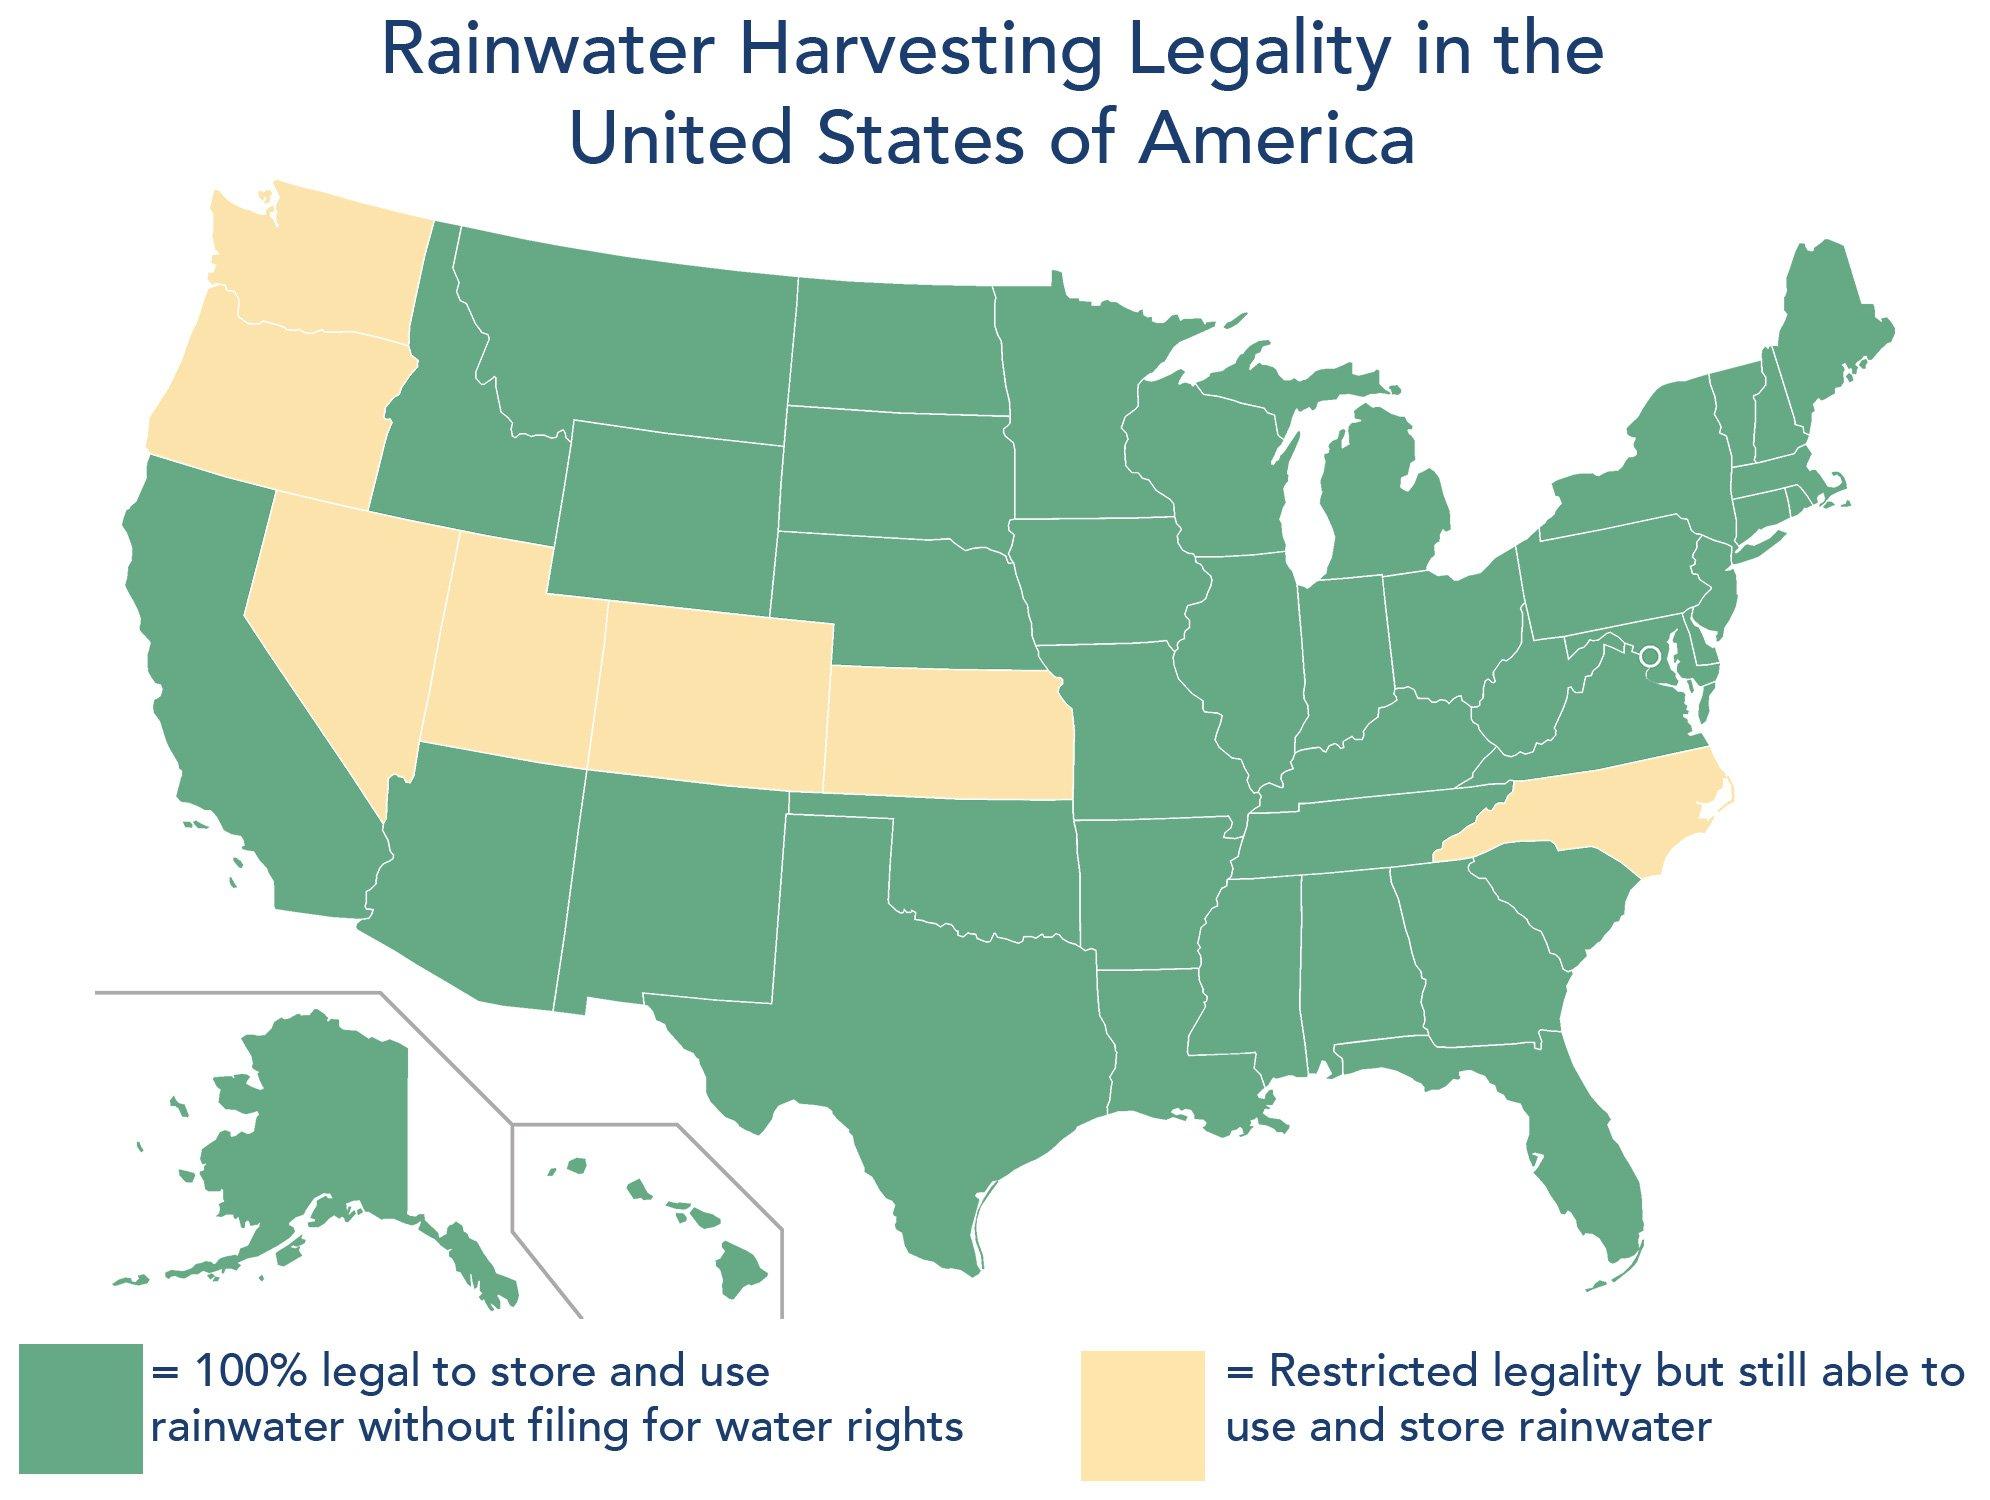 Is rainwater harvesting illegal